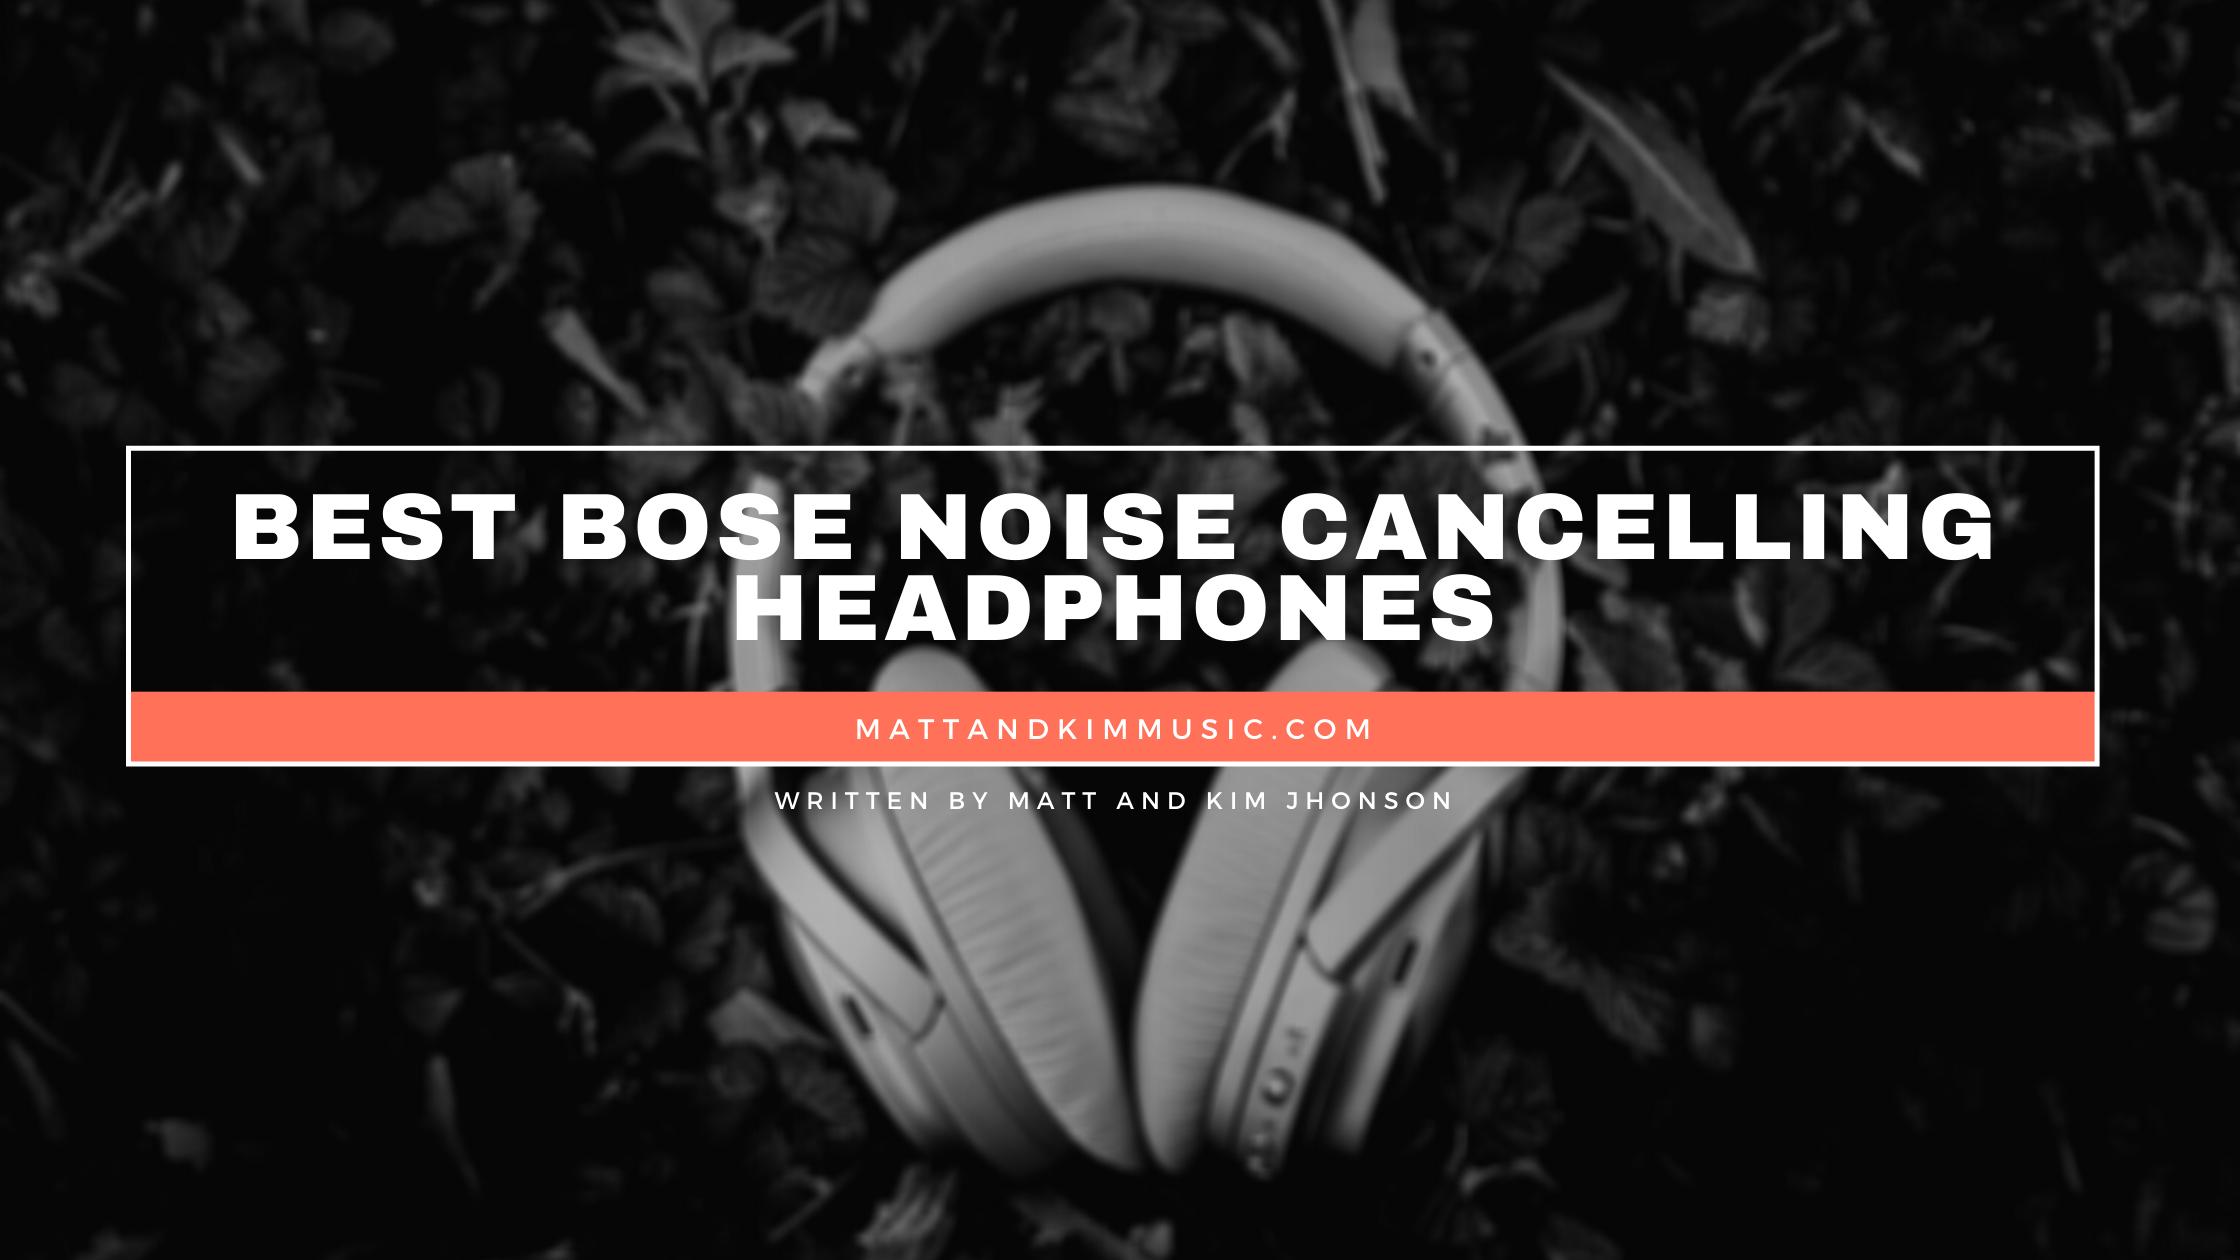 best bose noise cancelling headphones